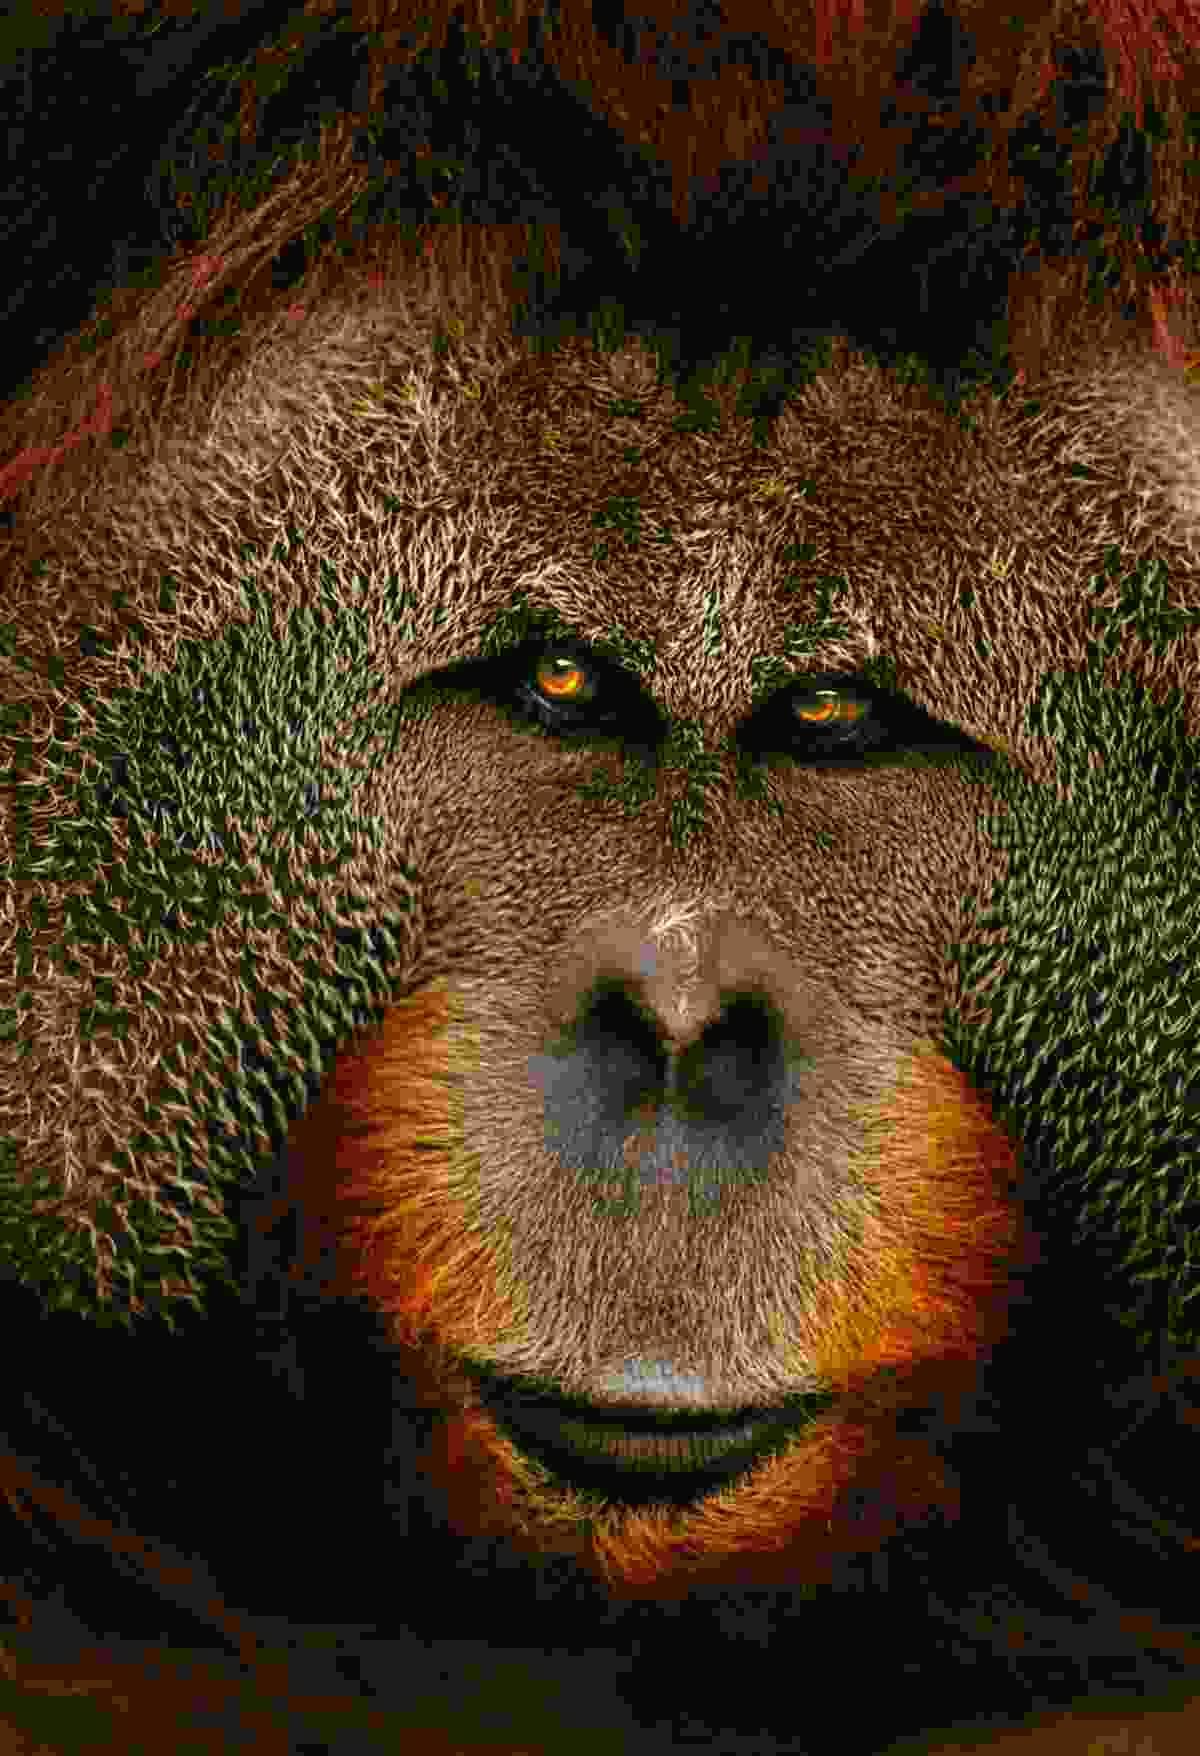 Sumatran Orangutan (Art Wolfe)